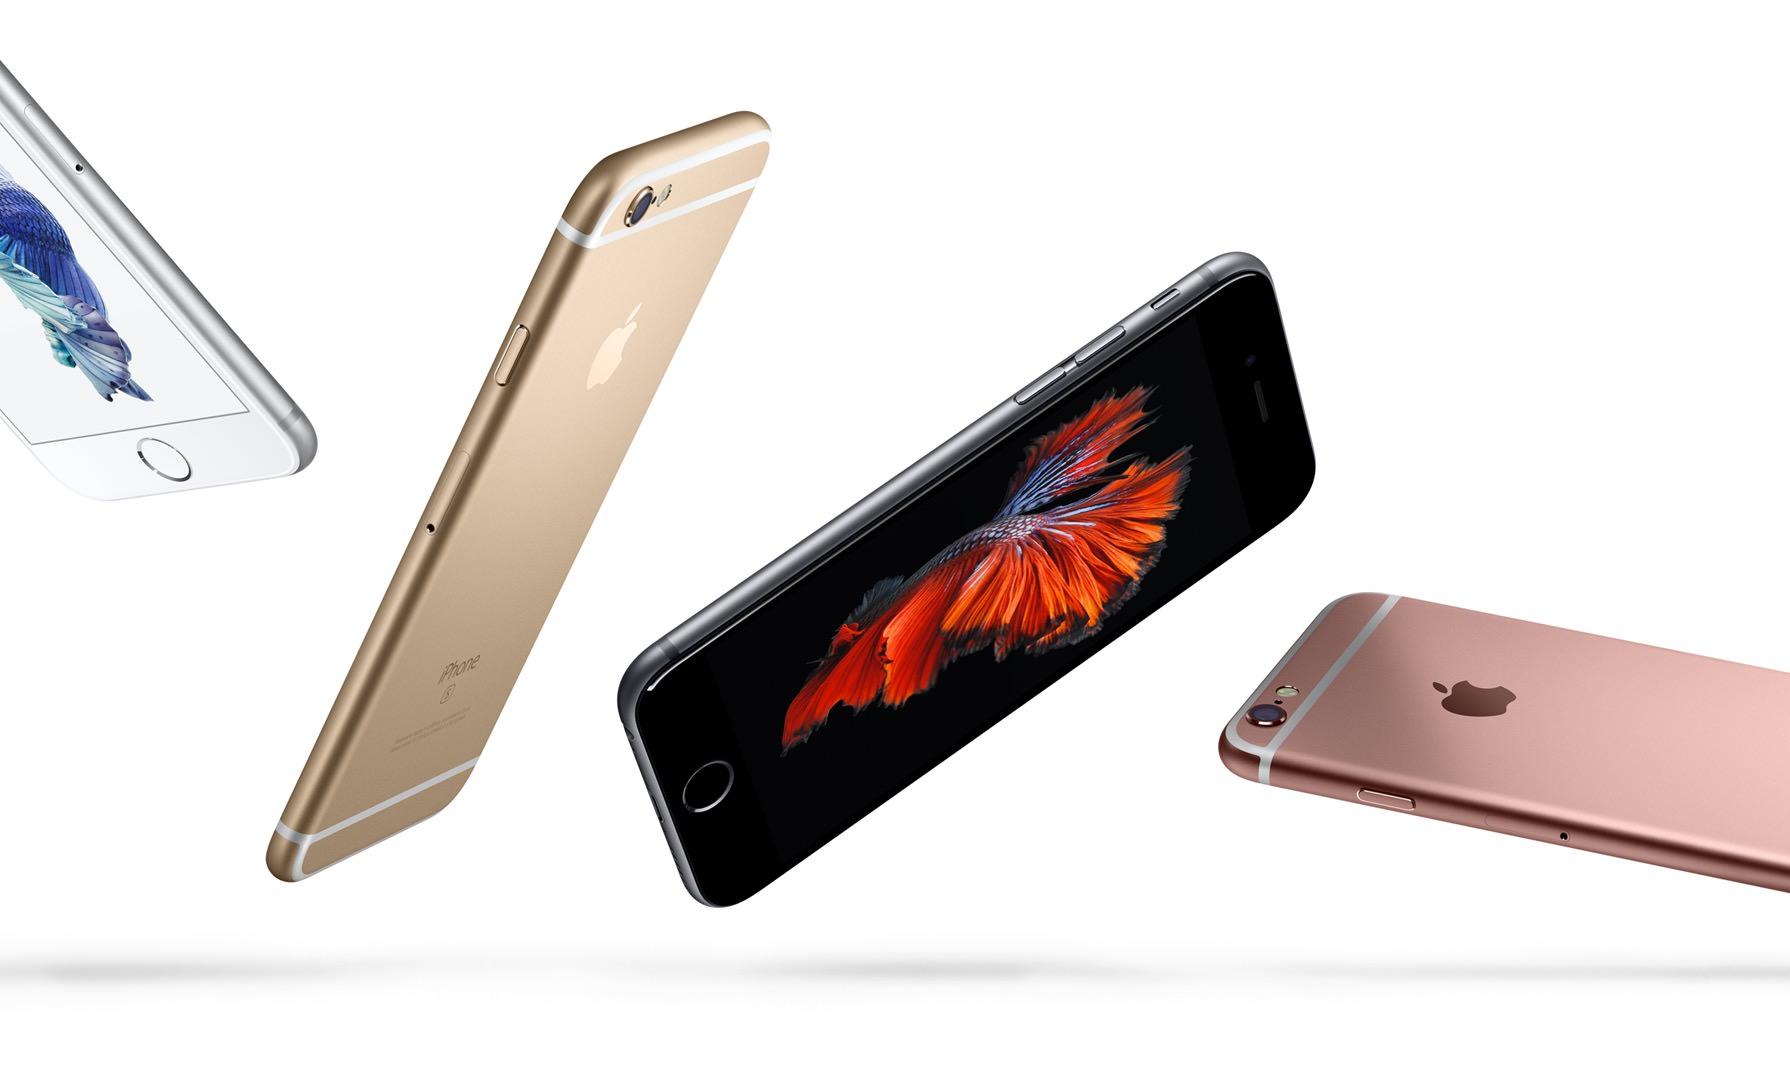 Apple、2017年に向けiPhoneのワイヤレス充電を開発中